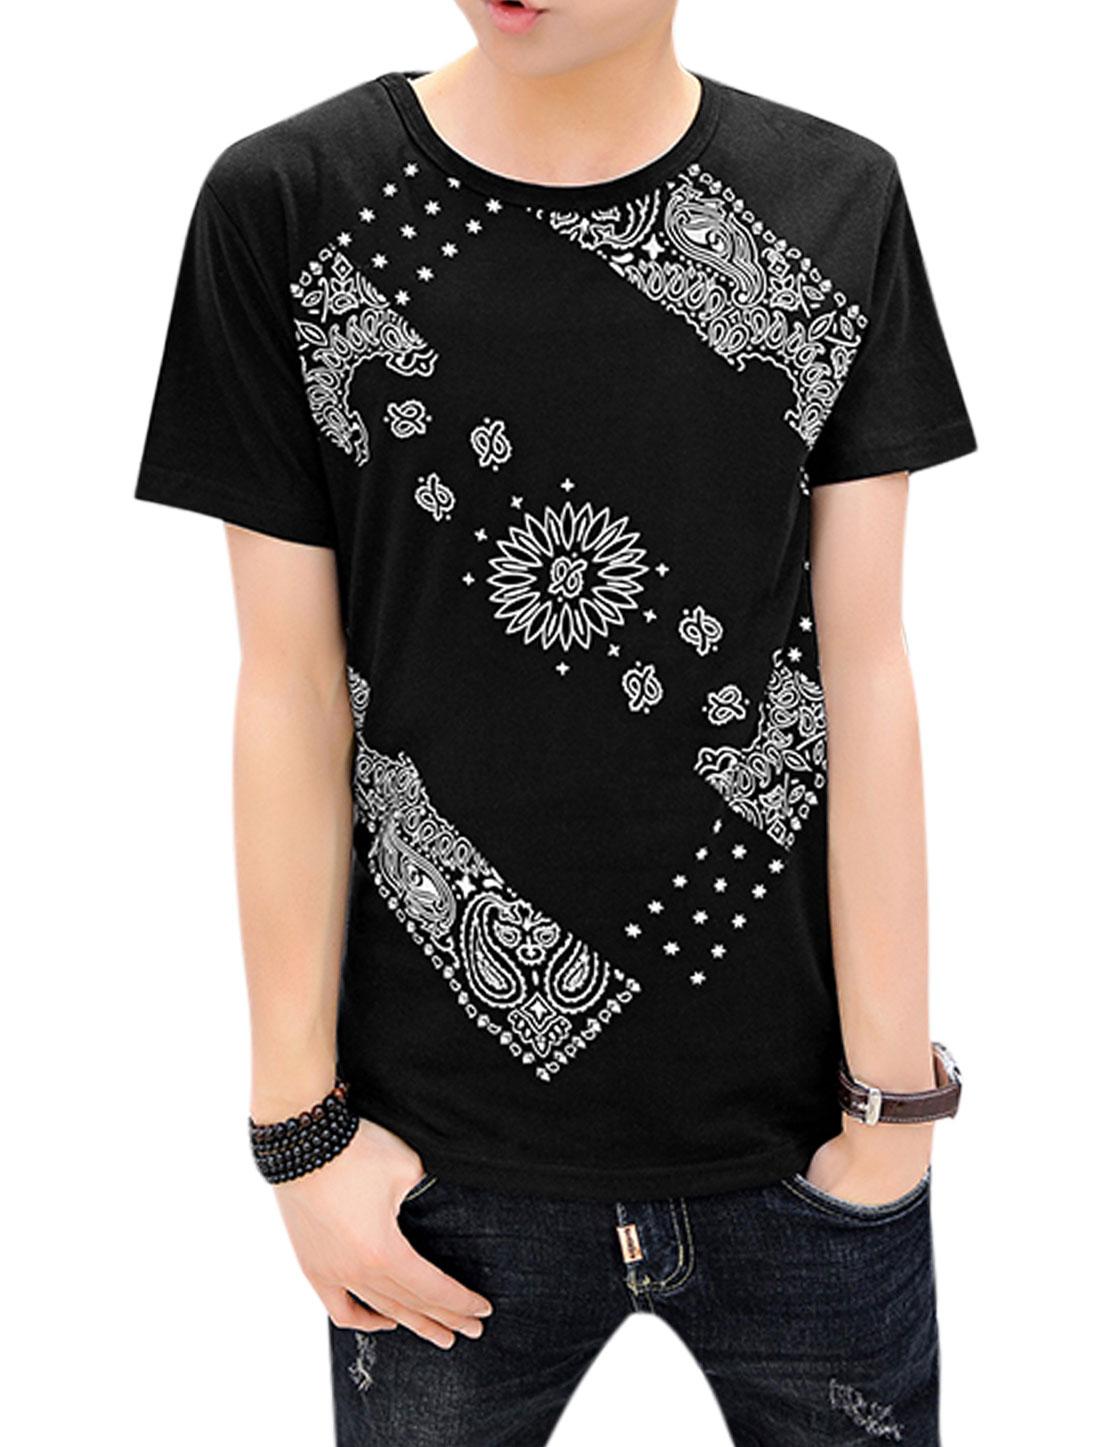 Men Short Sleeve Round Neck Stars Novelty Print Casual T-Shirt Black M